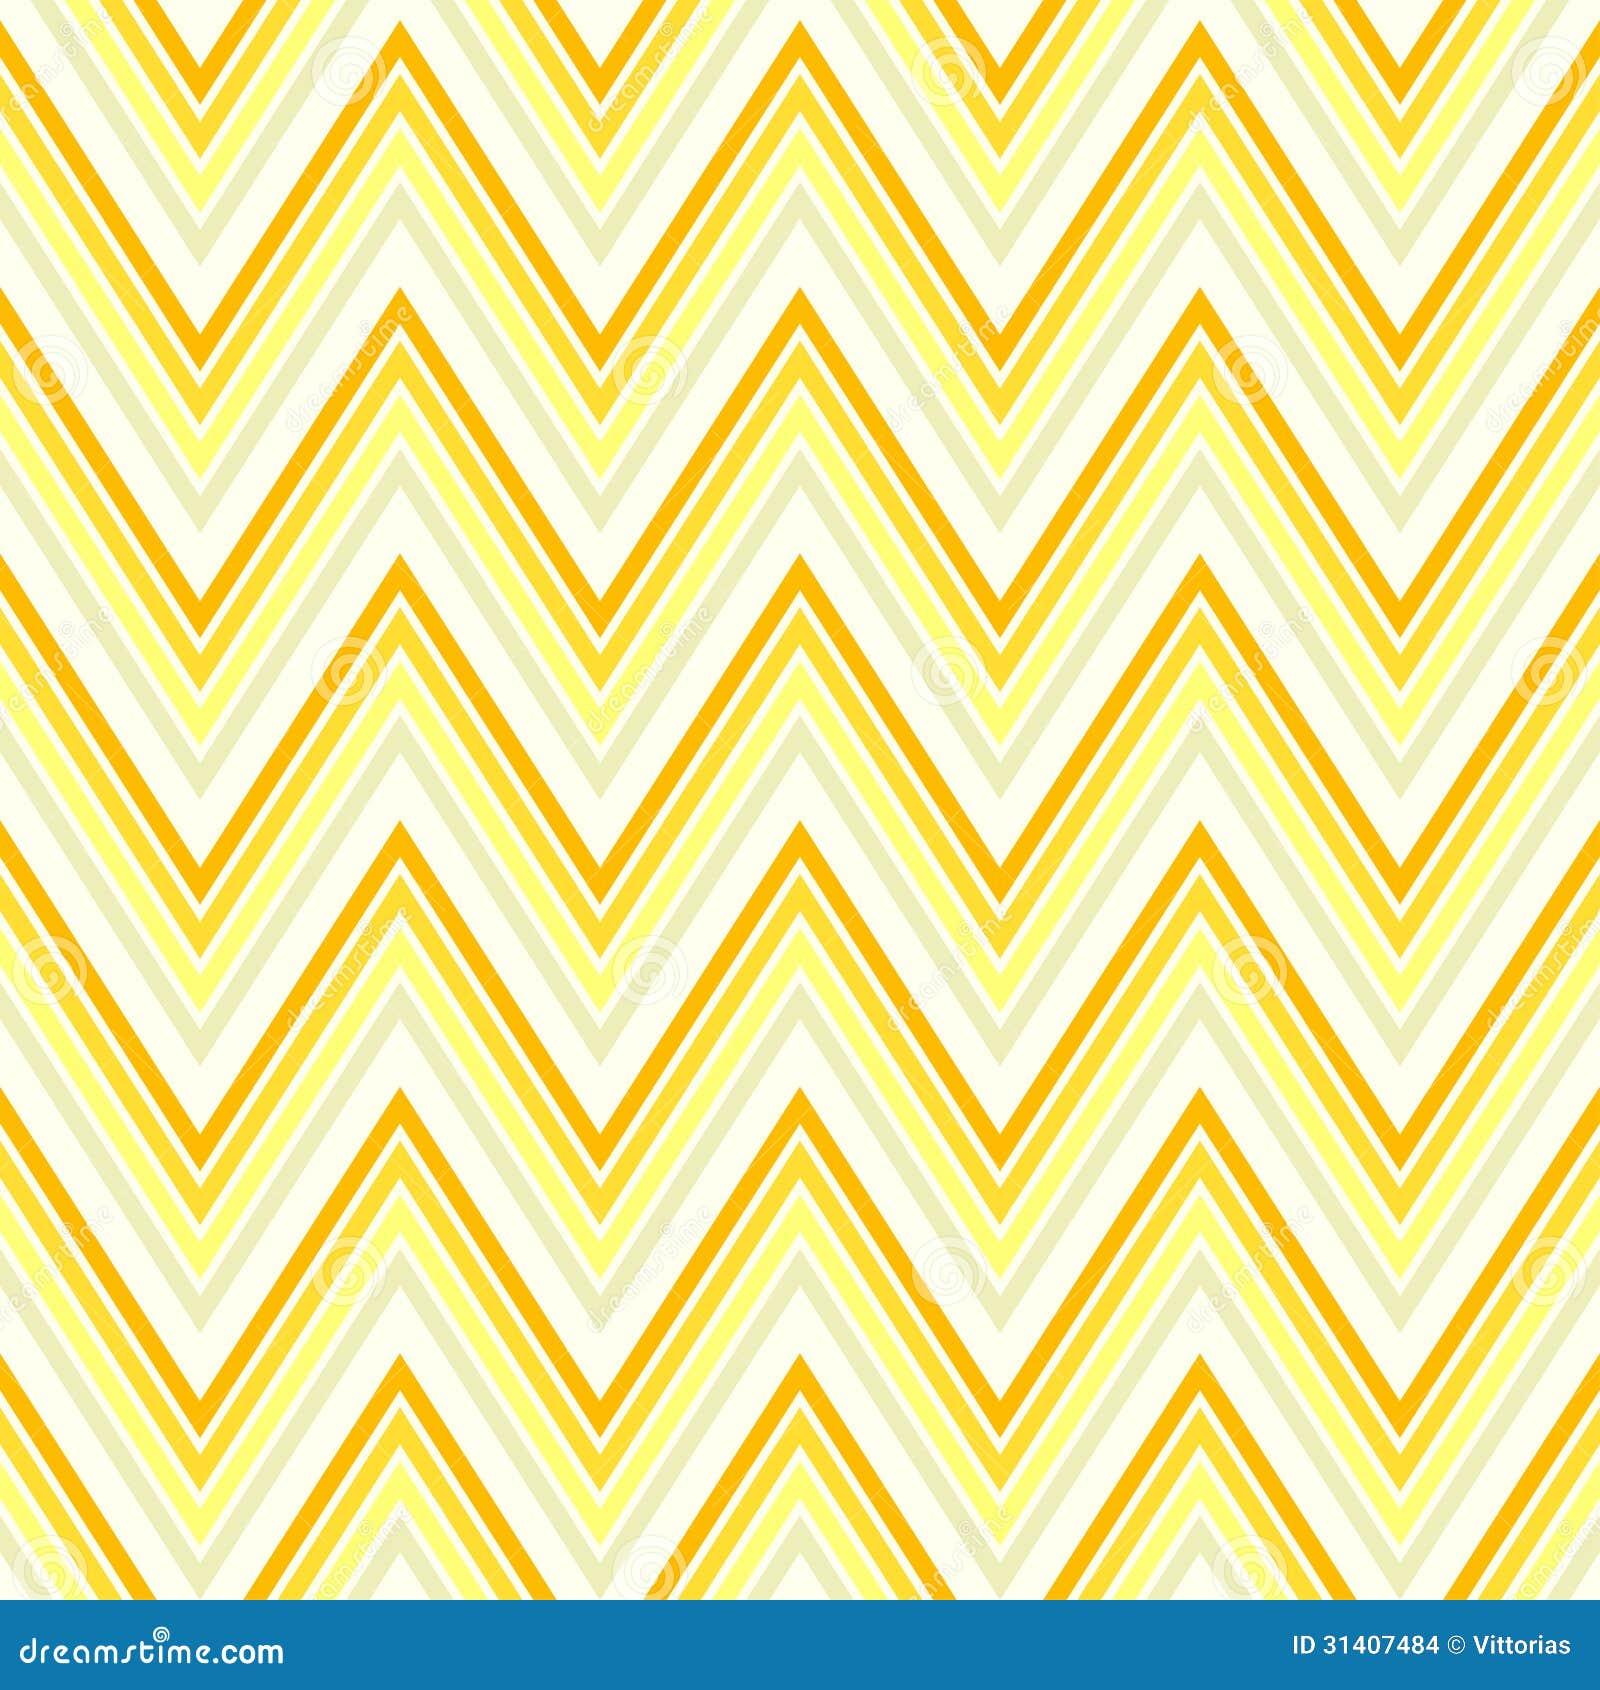 Scrapbook paper as wallpaper - Seamless Chevron Pattern In Retro Style